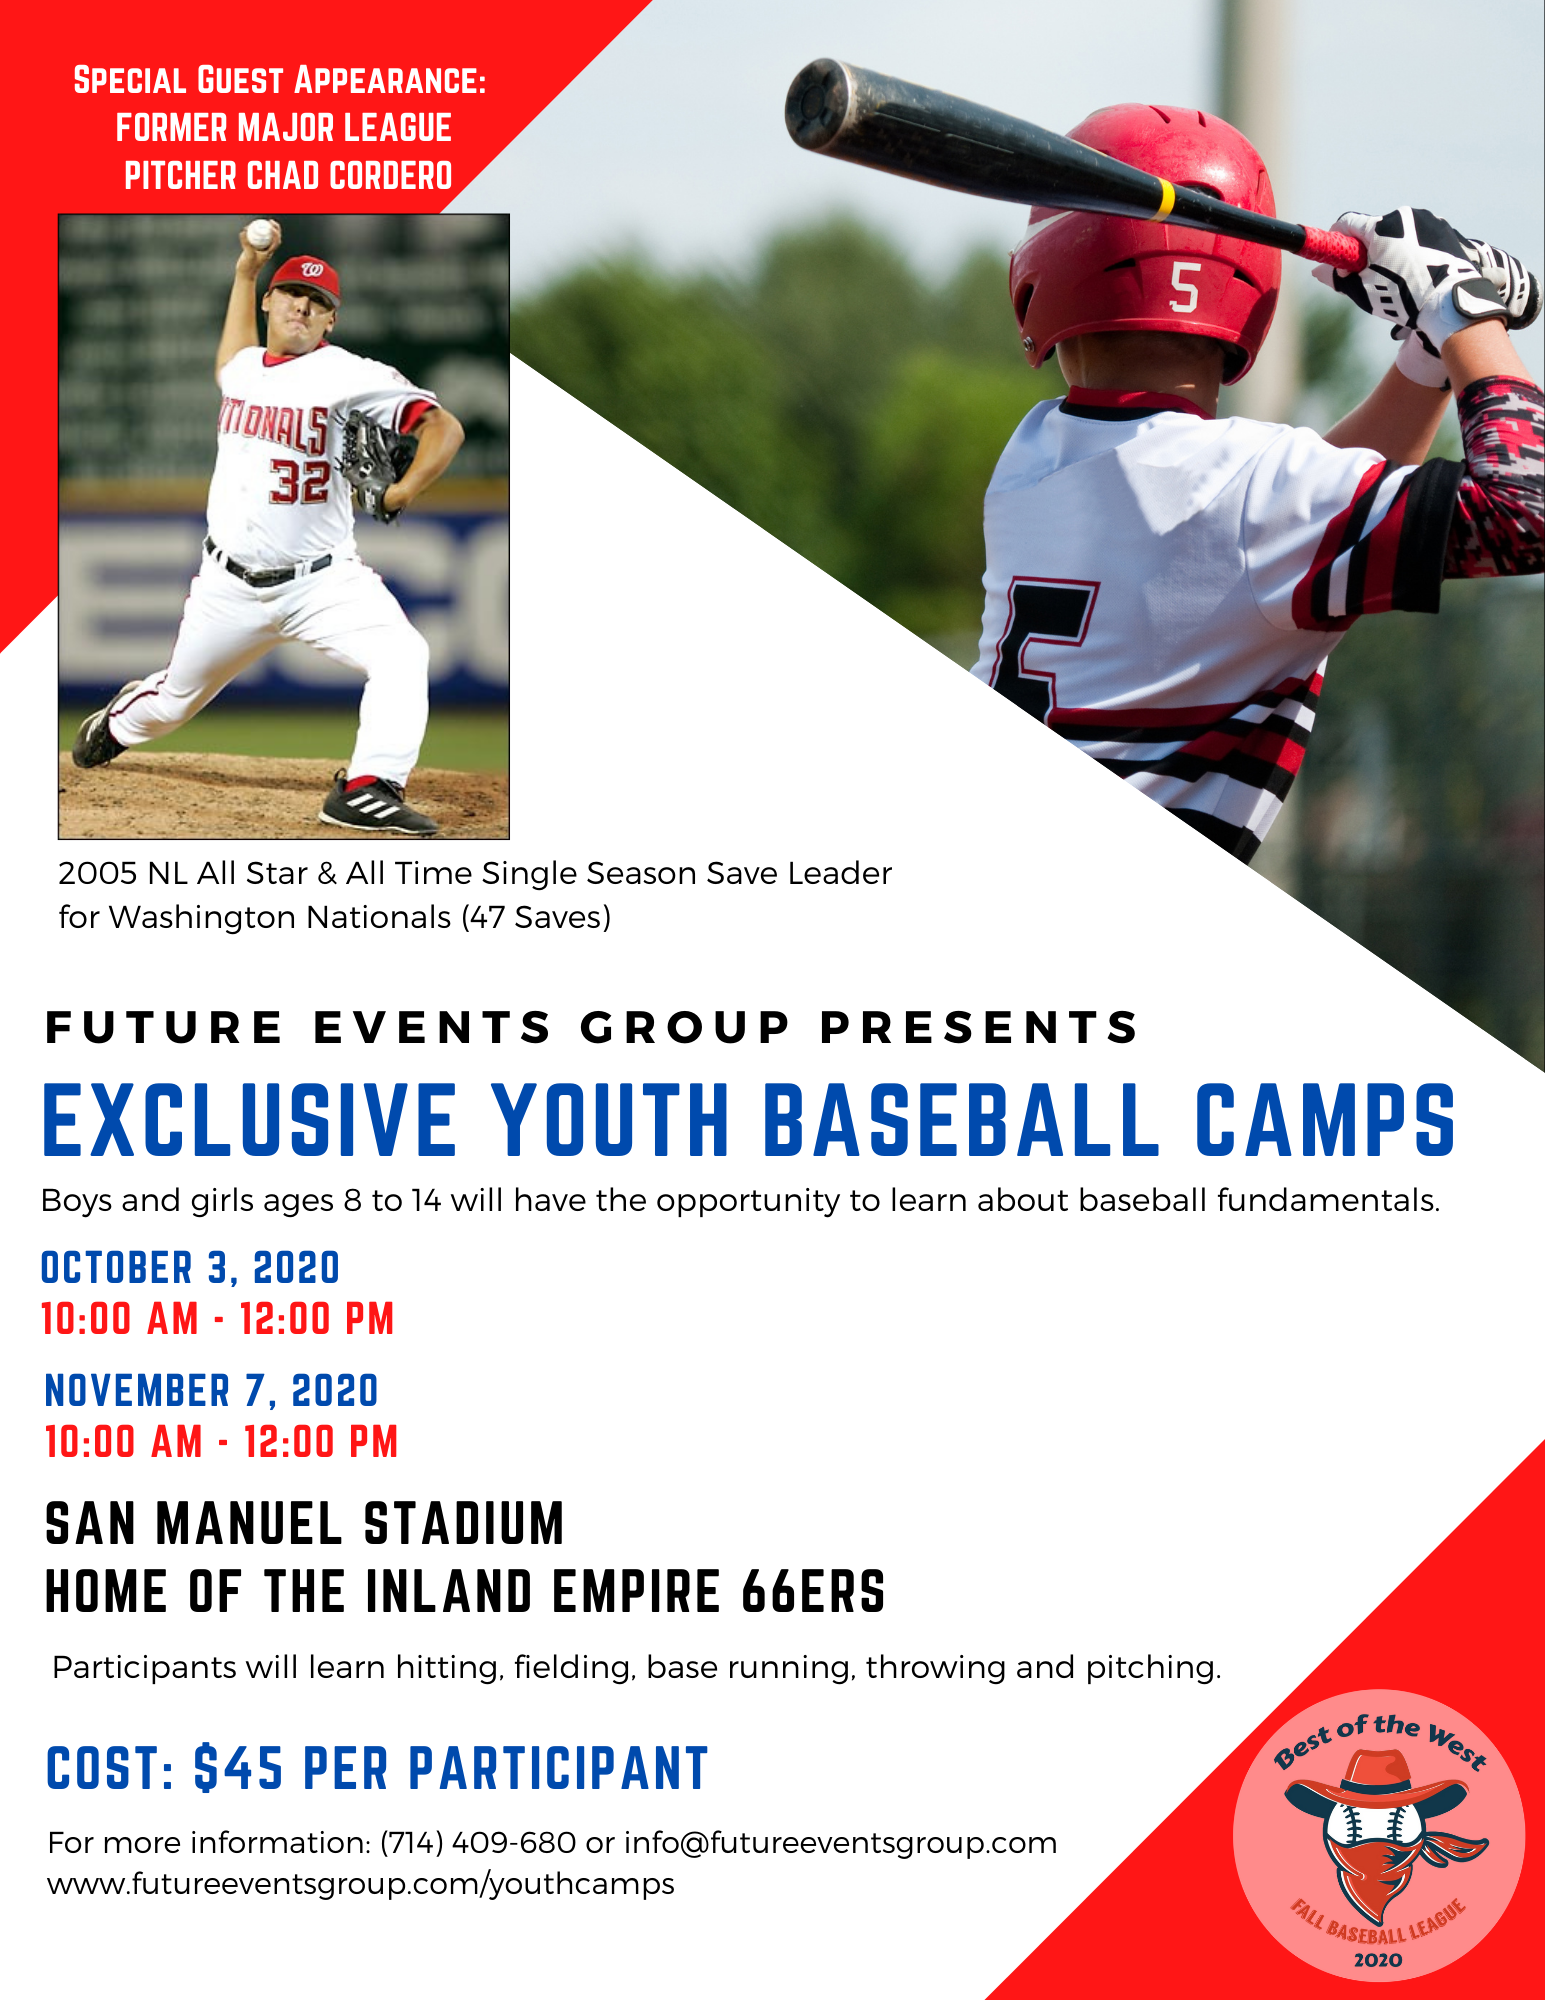 Youth - Baseball Camps rev 09-28-2020